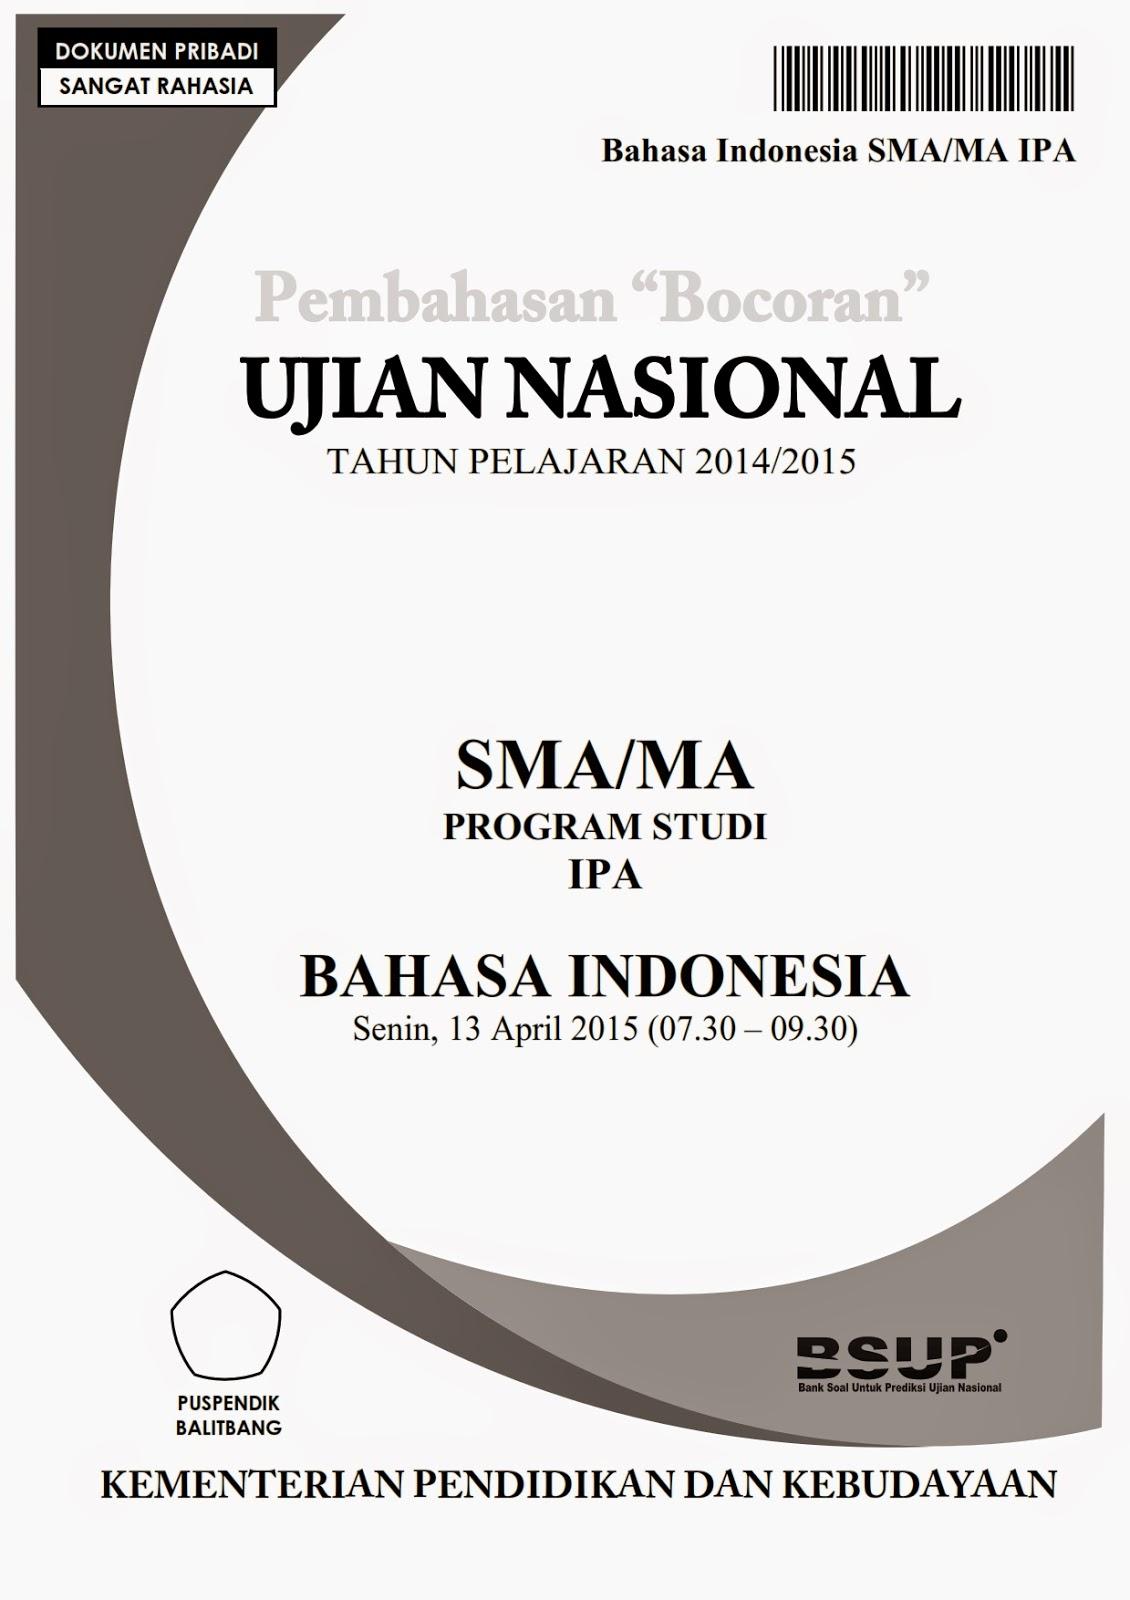 Pembahasan Bocoran Soal Un Bahasa Indonesia Sma 2015